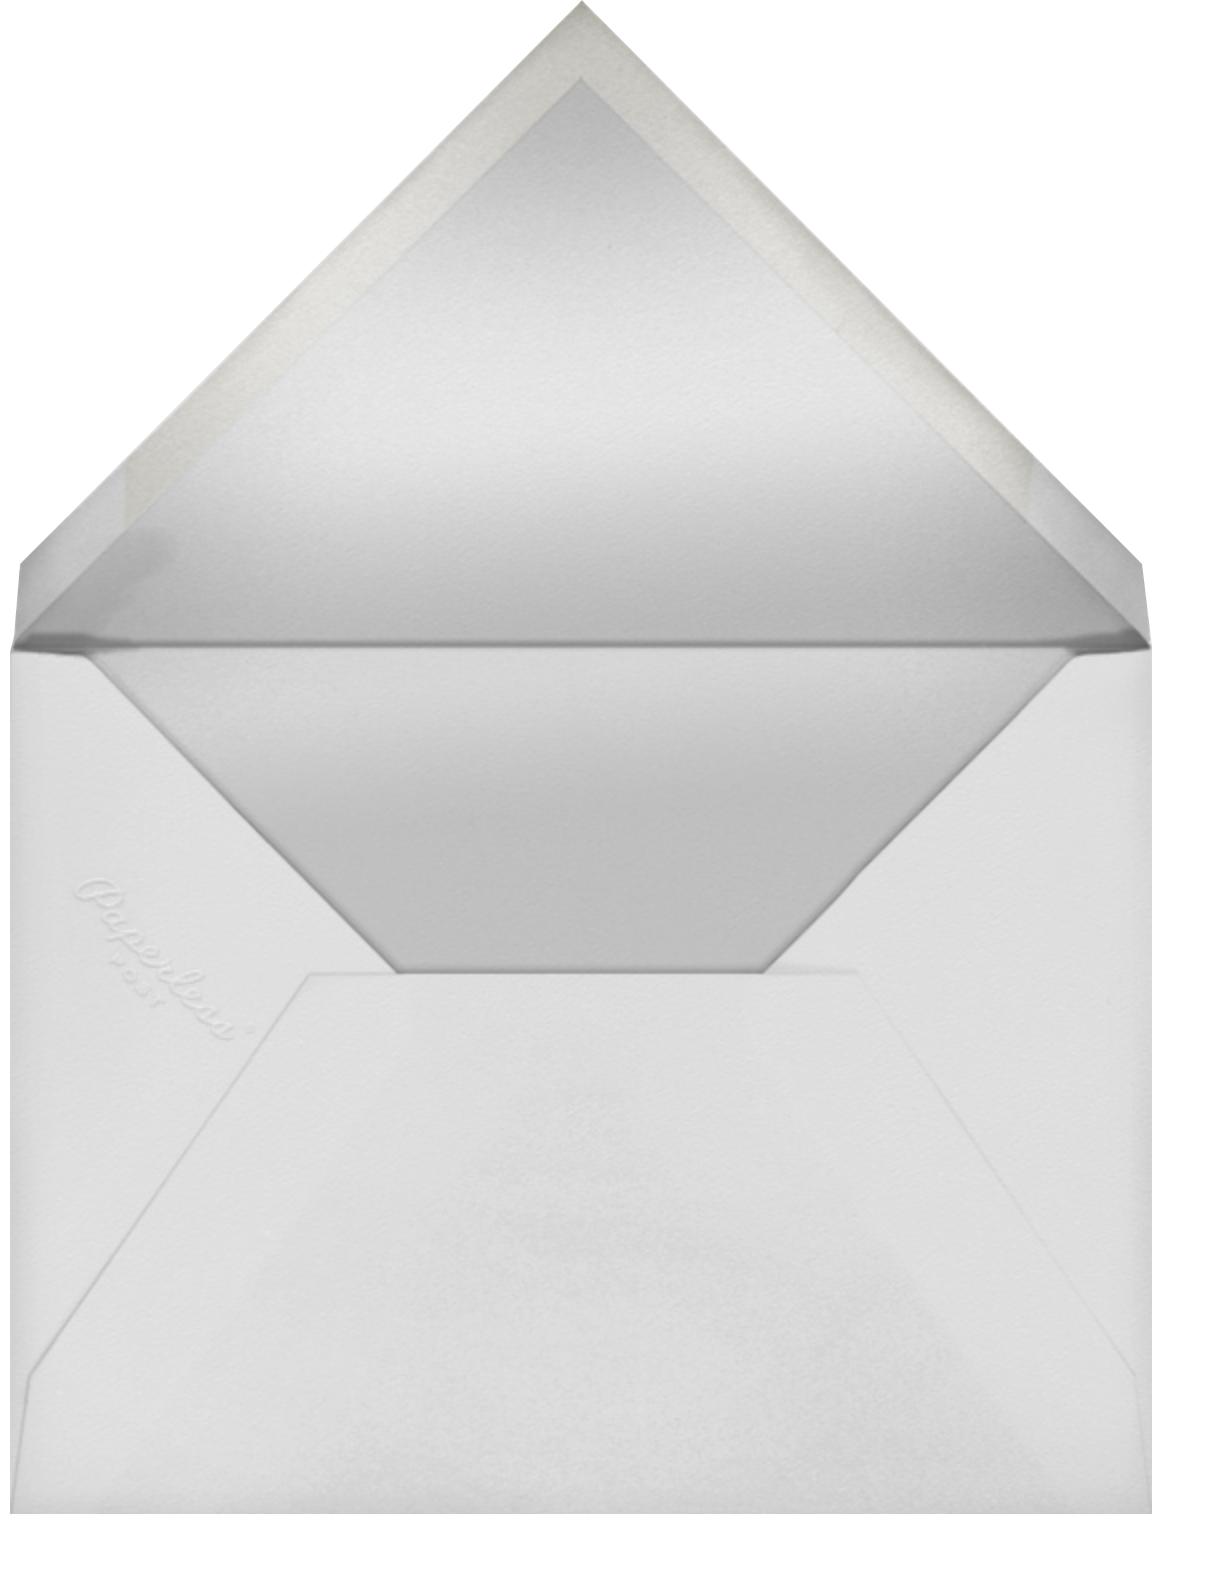 Emblem (Menu) - Navy - Bernard Maisner - Menus - envelope back